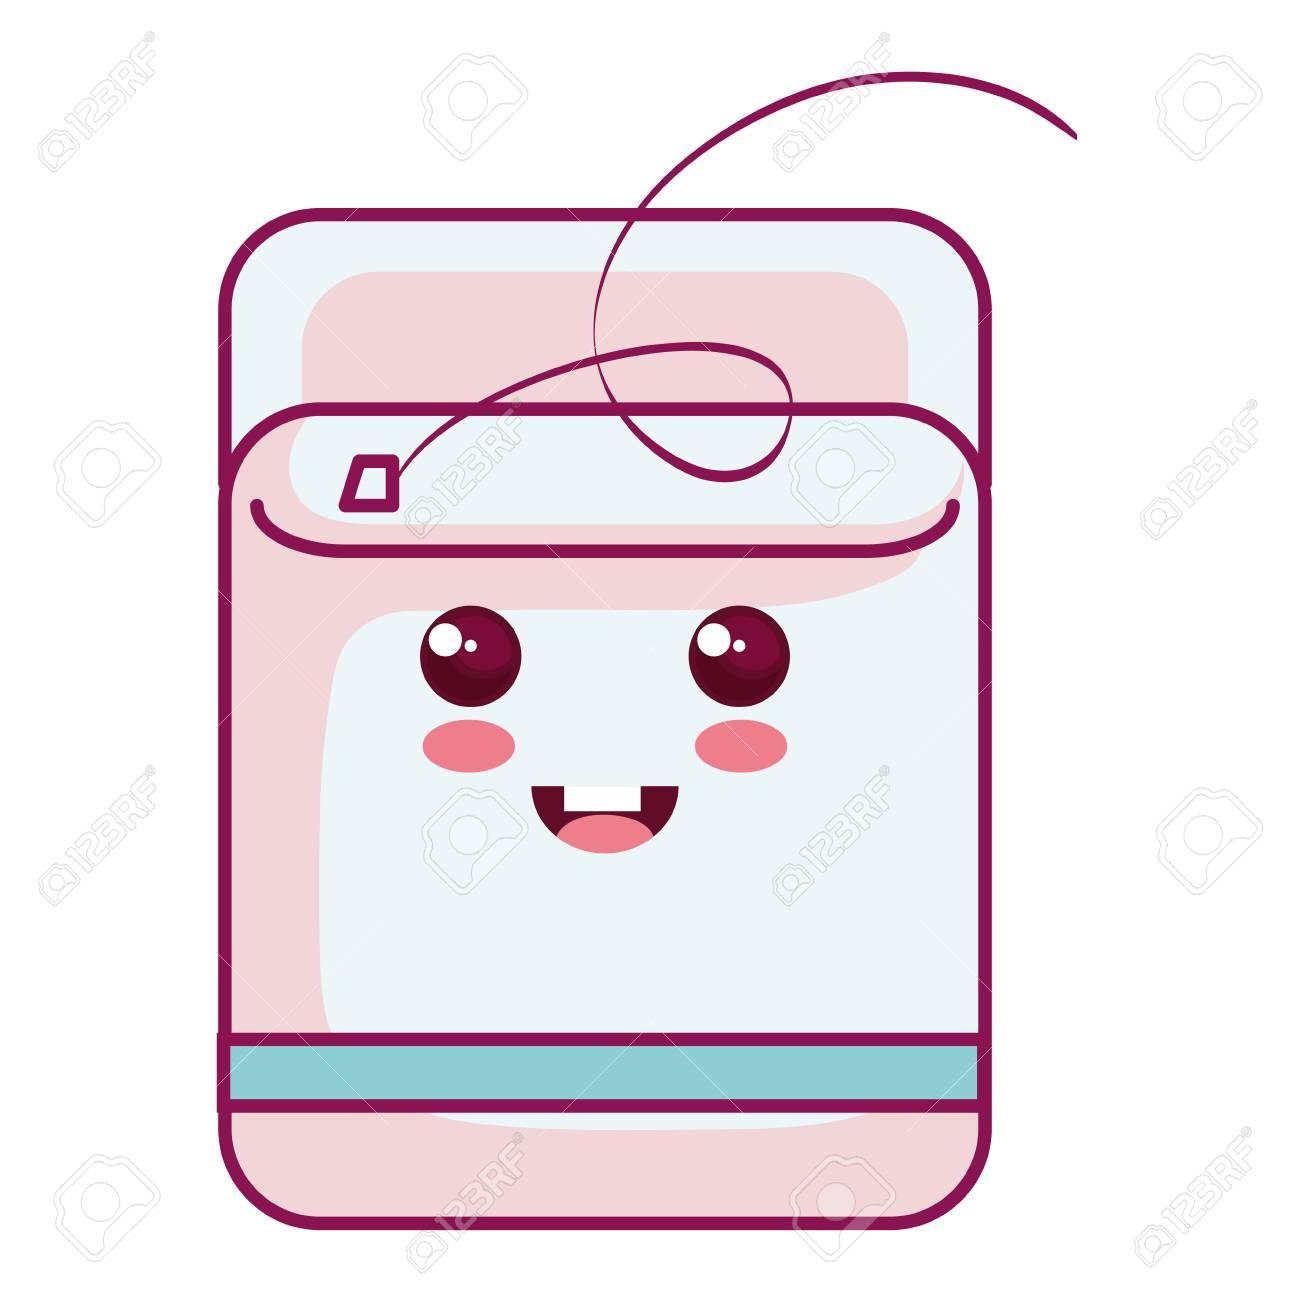 Dental Floss kawaii character vector illustration design.